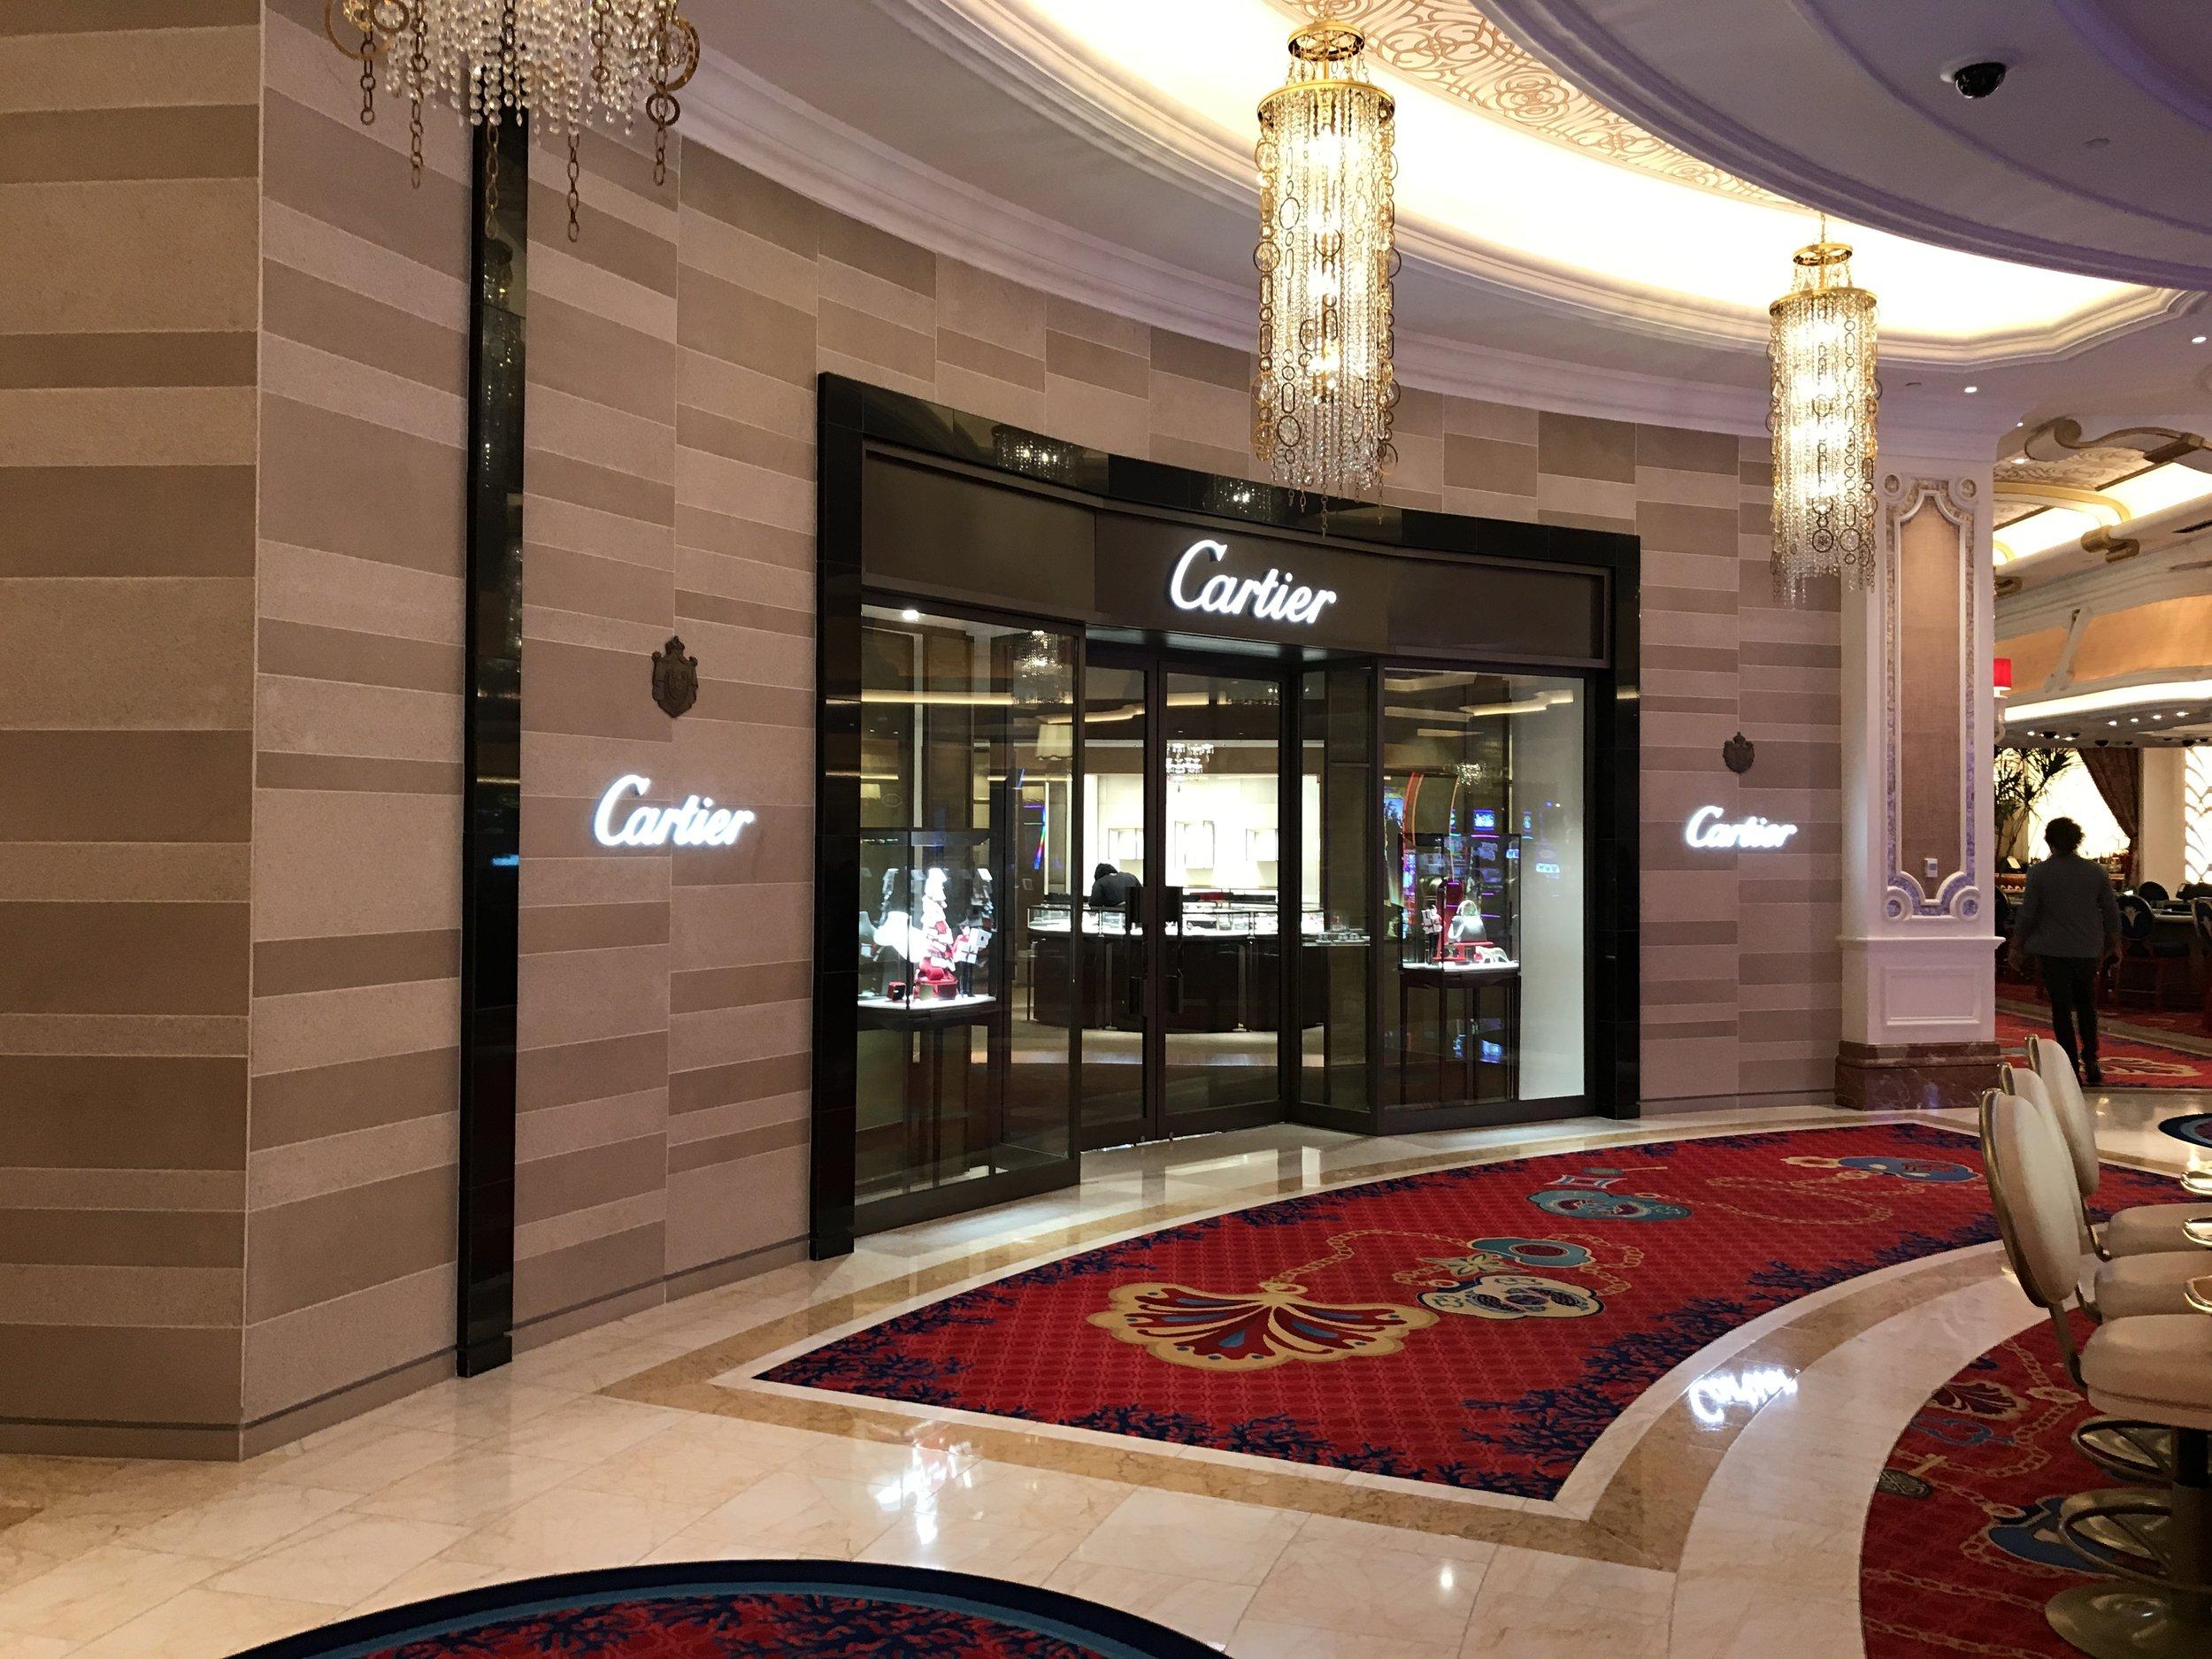 Cartier Store - Nassau, Bahamas